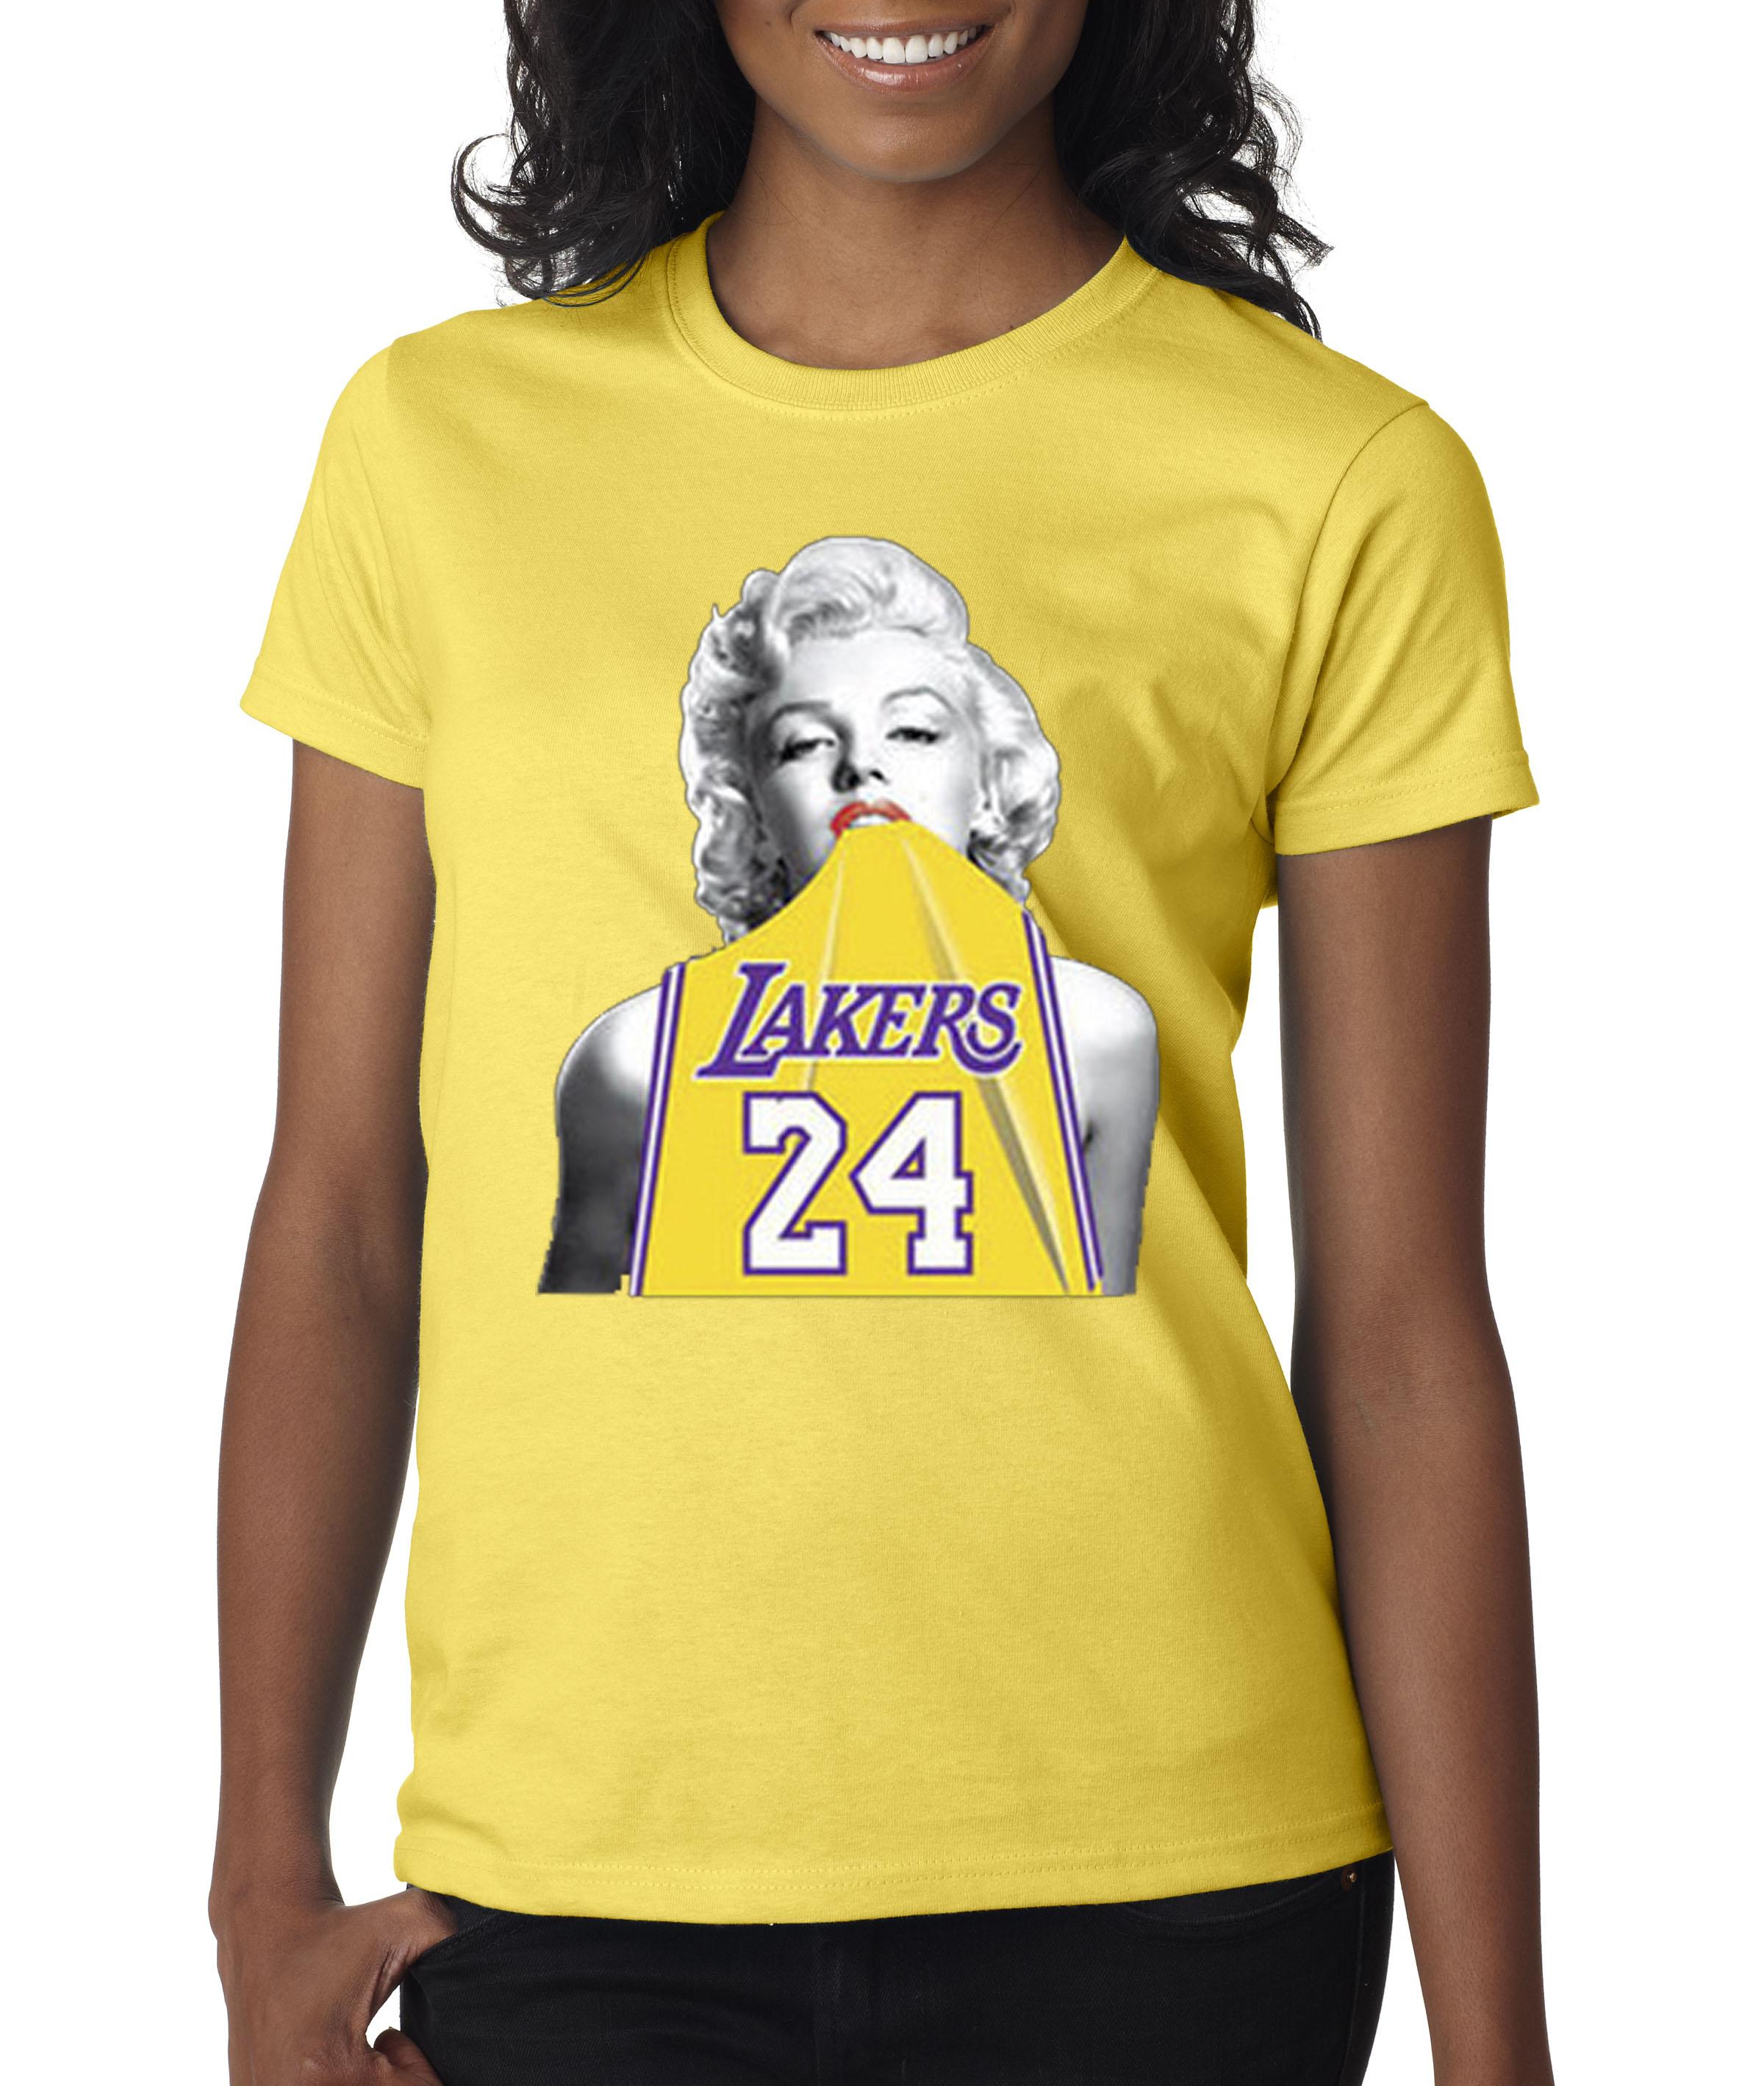 New Way - New Way 412 - Women s T-Shirt Marilyn Monroe Lakers 24 Kobe Bryant  Jersey - Walmart.com e8b425c8a5